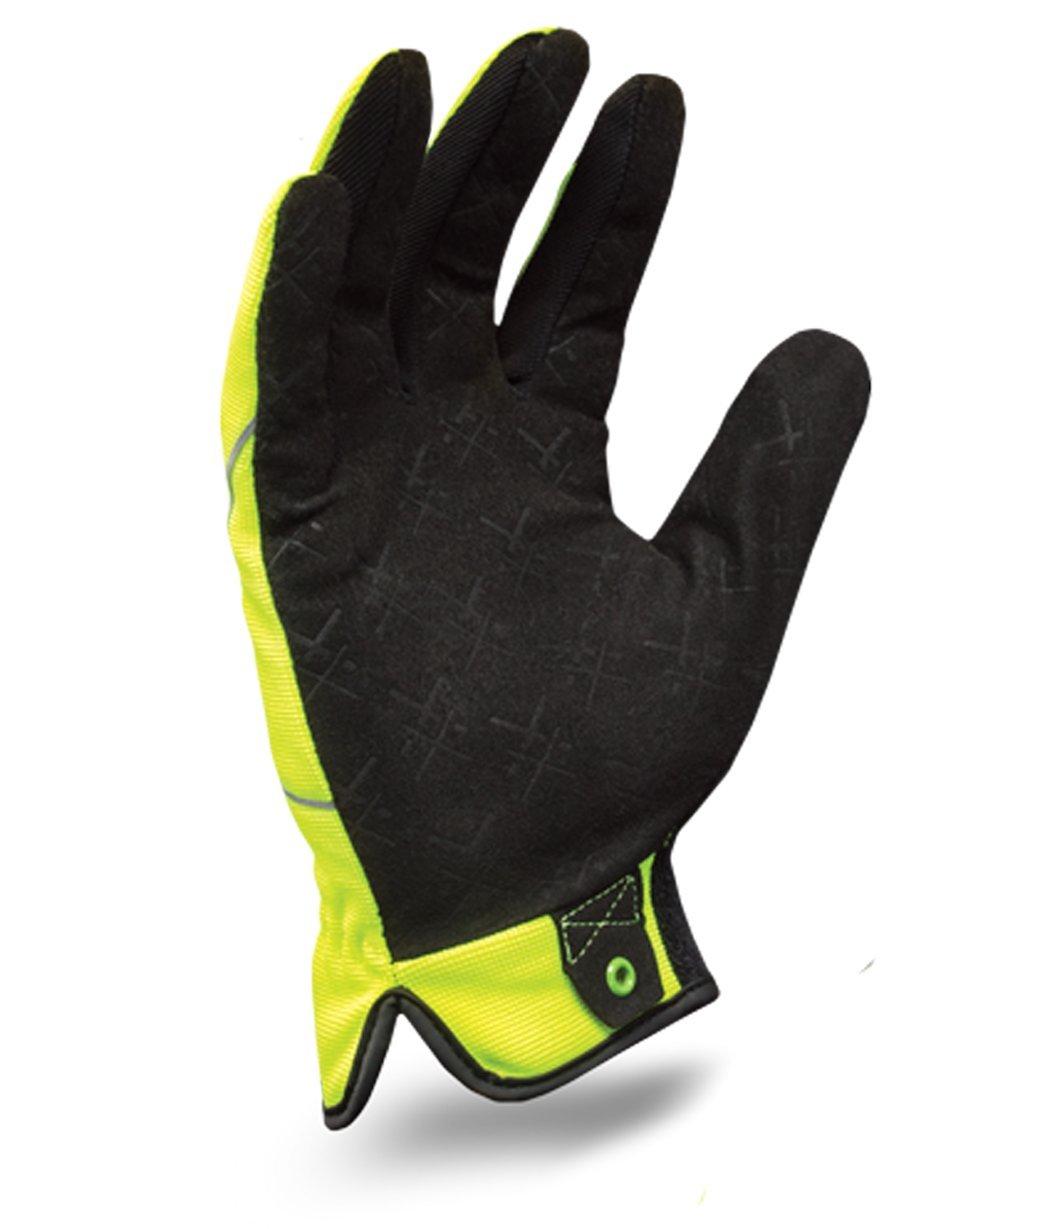 2 Pack Ironclad YS-EXOB-HS2-04-L Hi-Viz Utility Safety Gloves,1 Pair Orange and 1 Pair Yellow Large